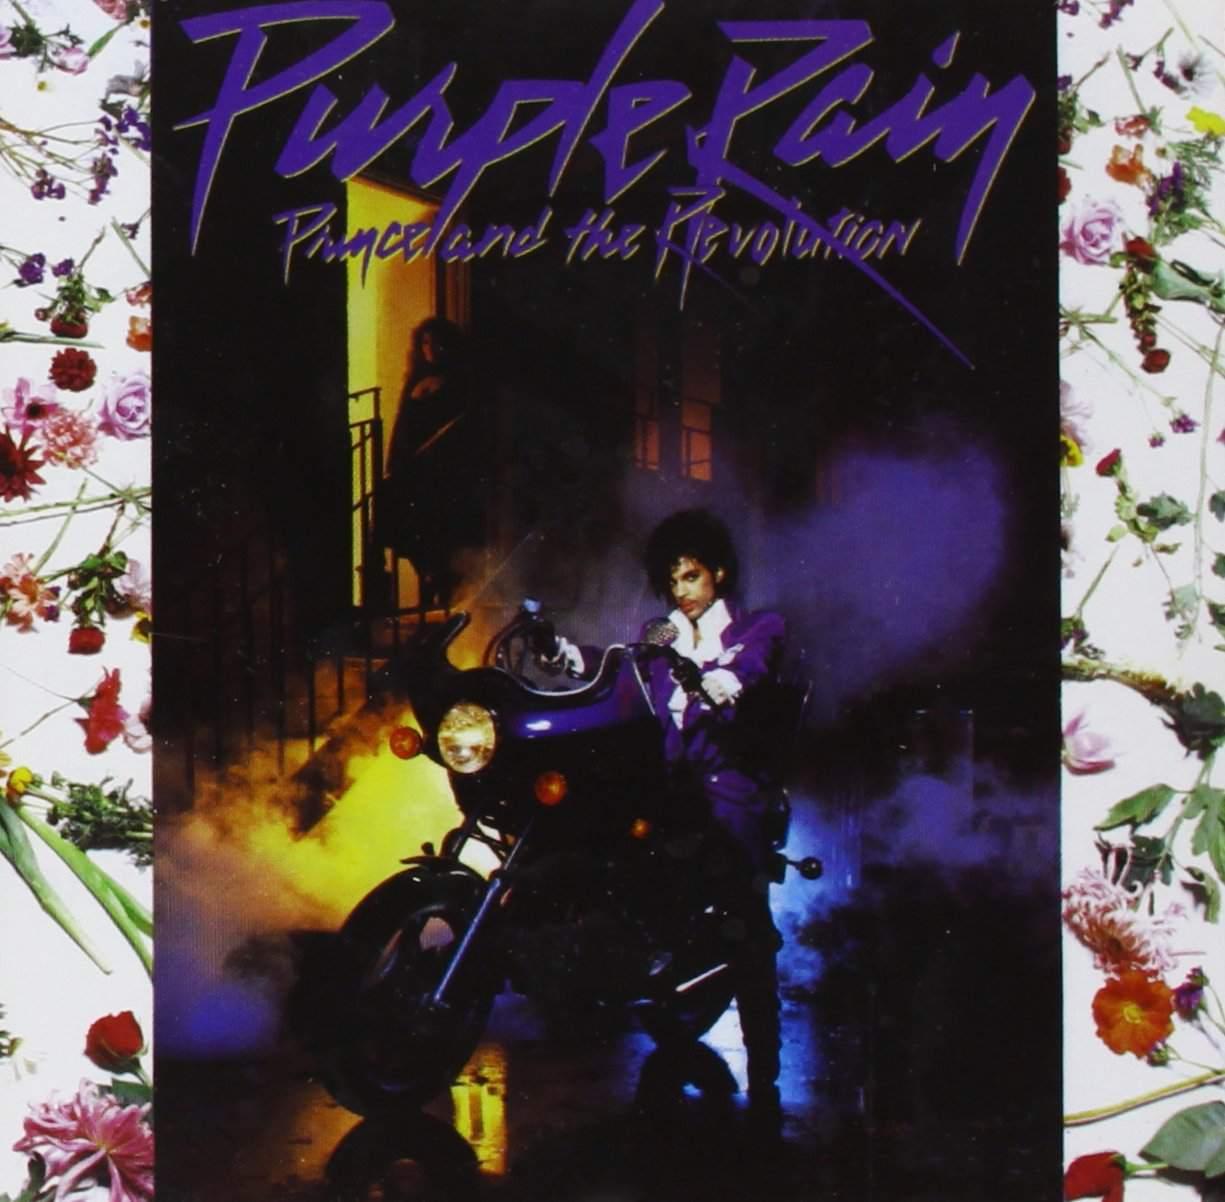 Prince and the Revolution Purple Rain